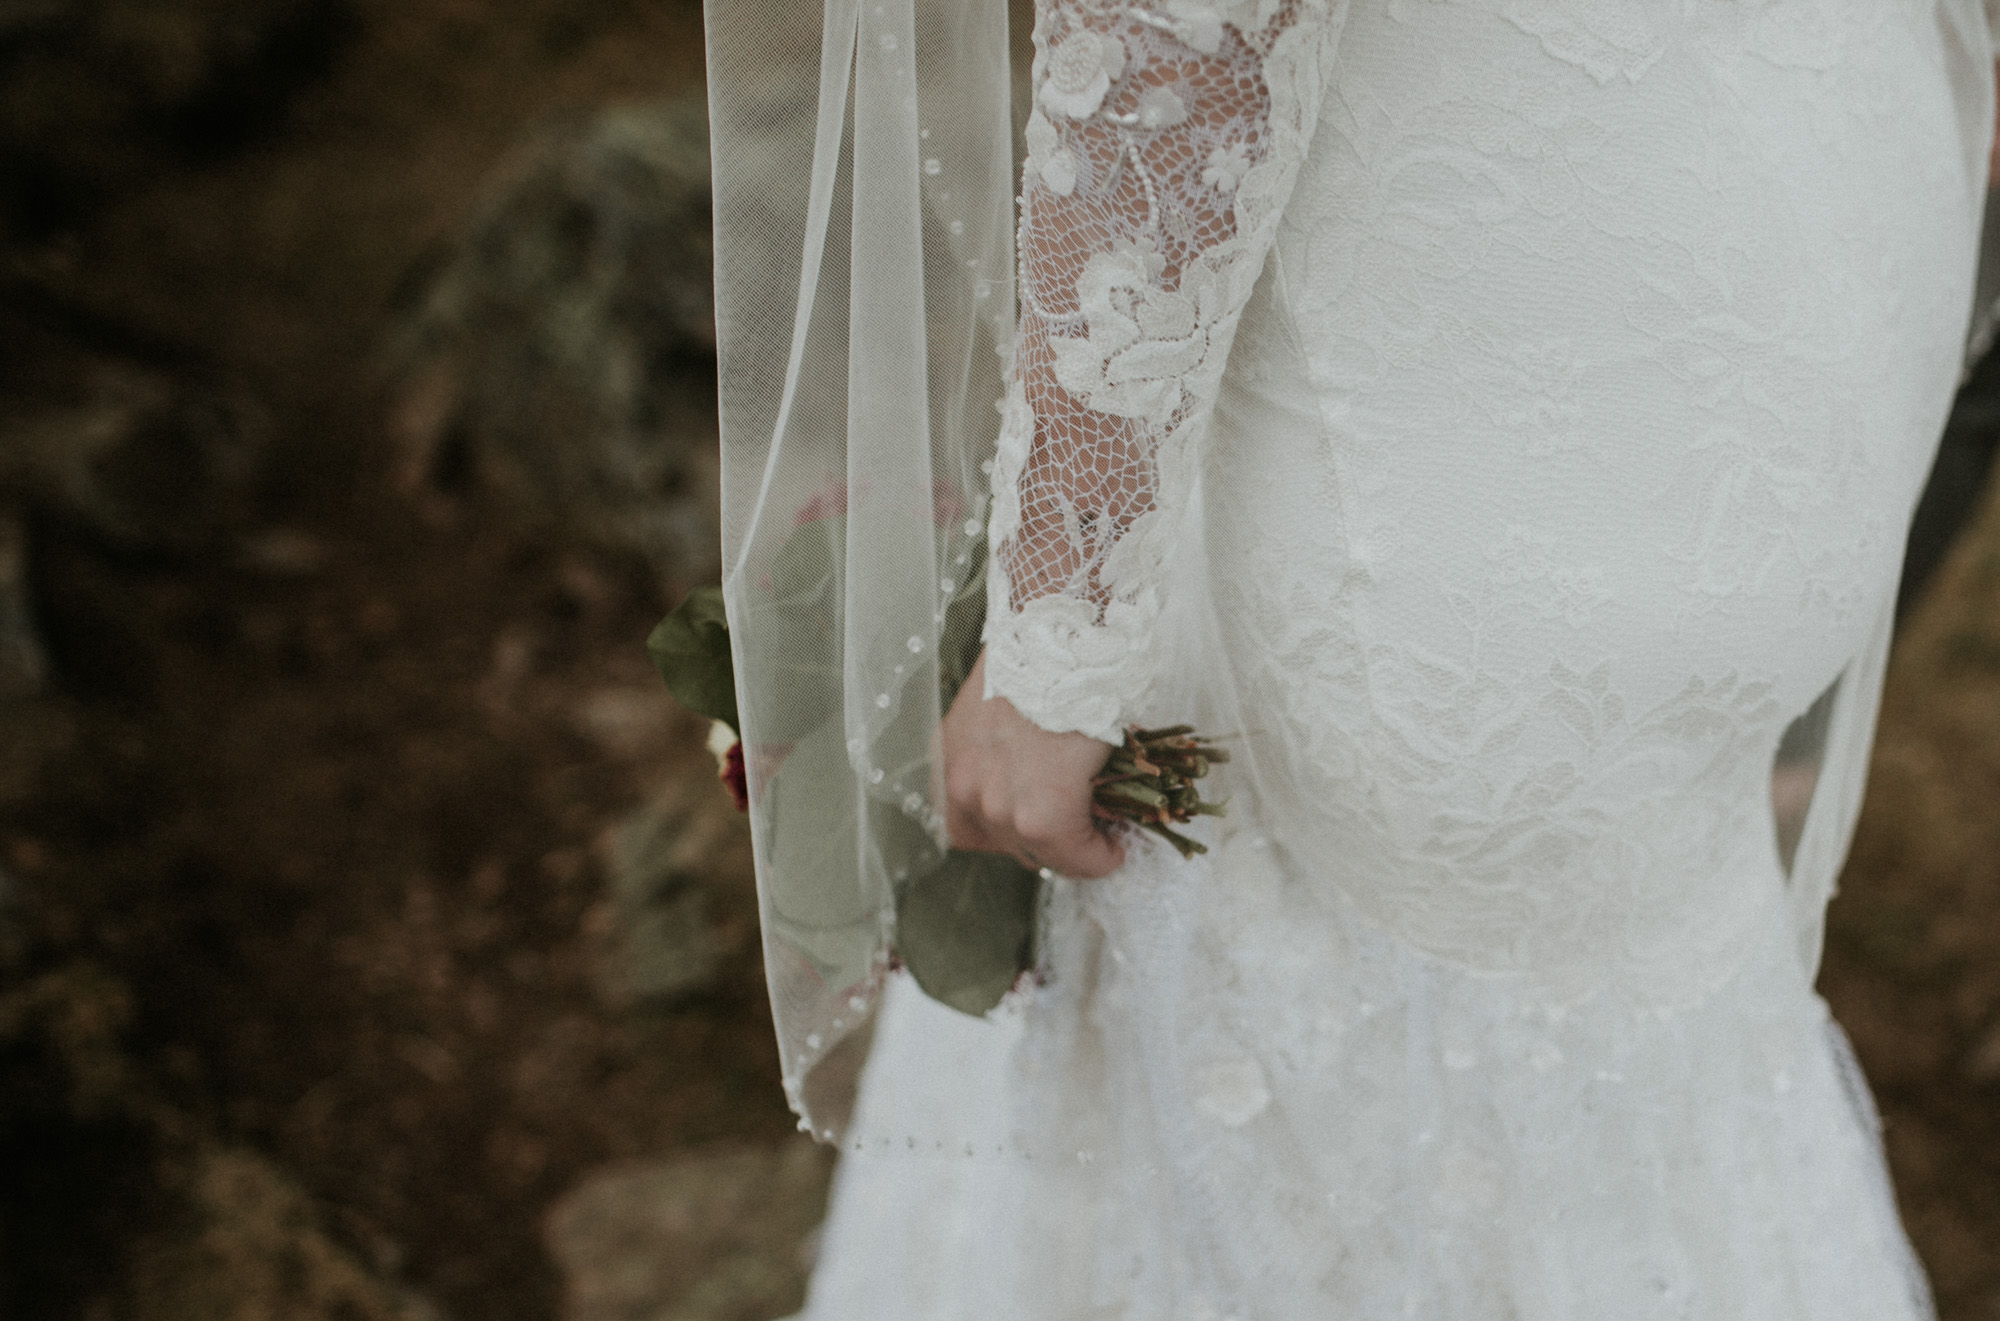 DanielaMarquardtPhotography_Hochzeitsfotograf_Düsseldorf_Köln_Mallorca_Bayern_Austria_Harz_LinaundMaik_Afterwedding-Shooting_Weddingphotographer_Ibiza_Tuskany_Italien_Toskana3